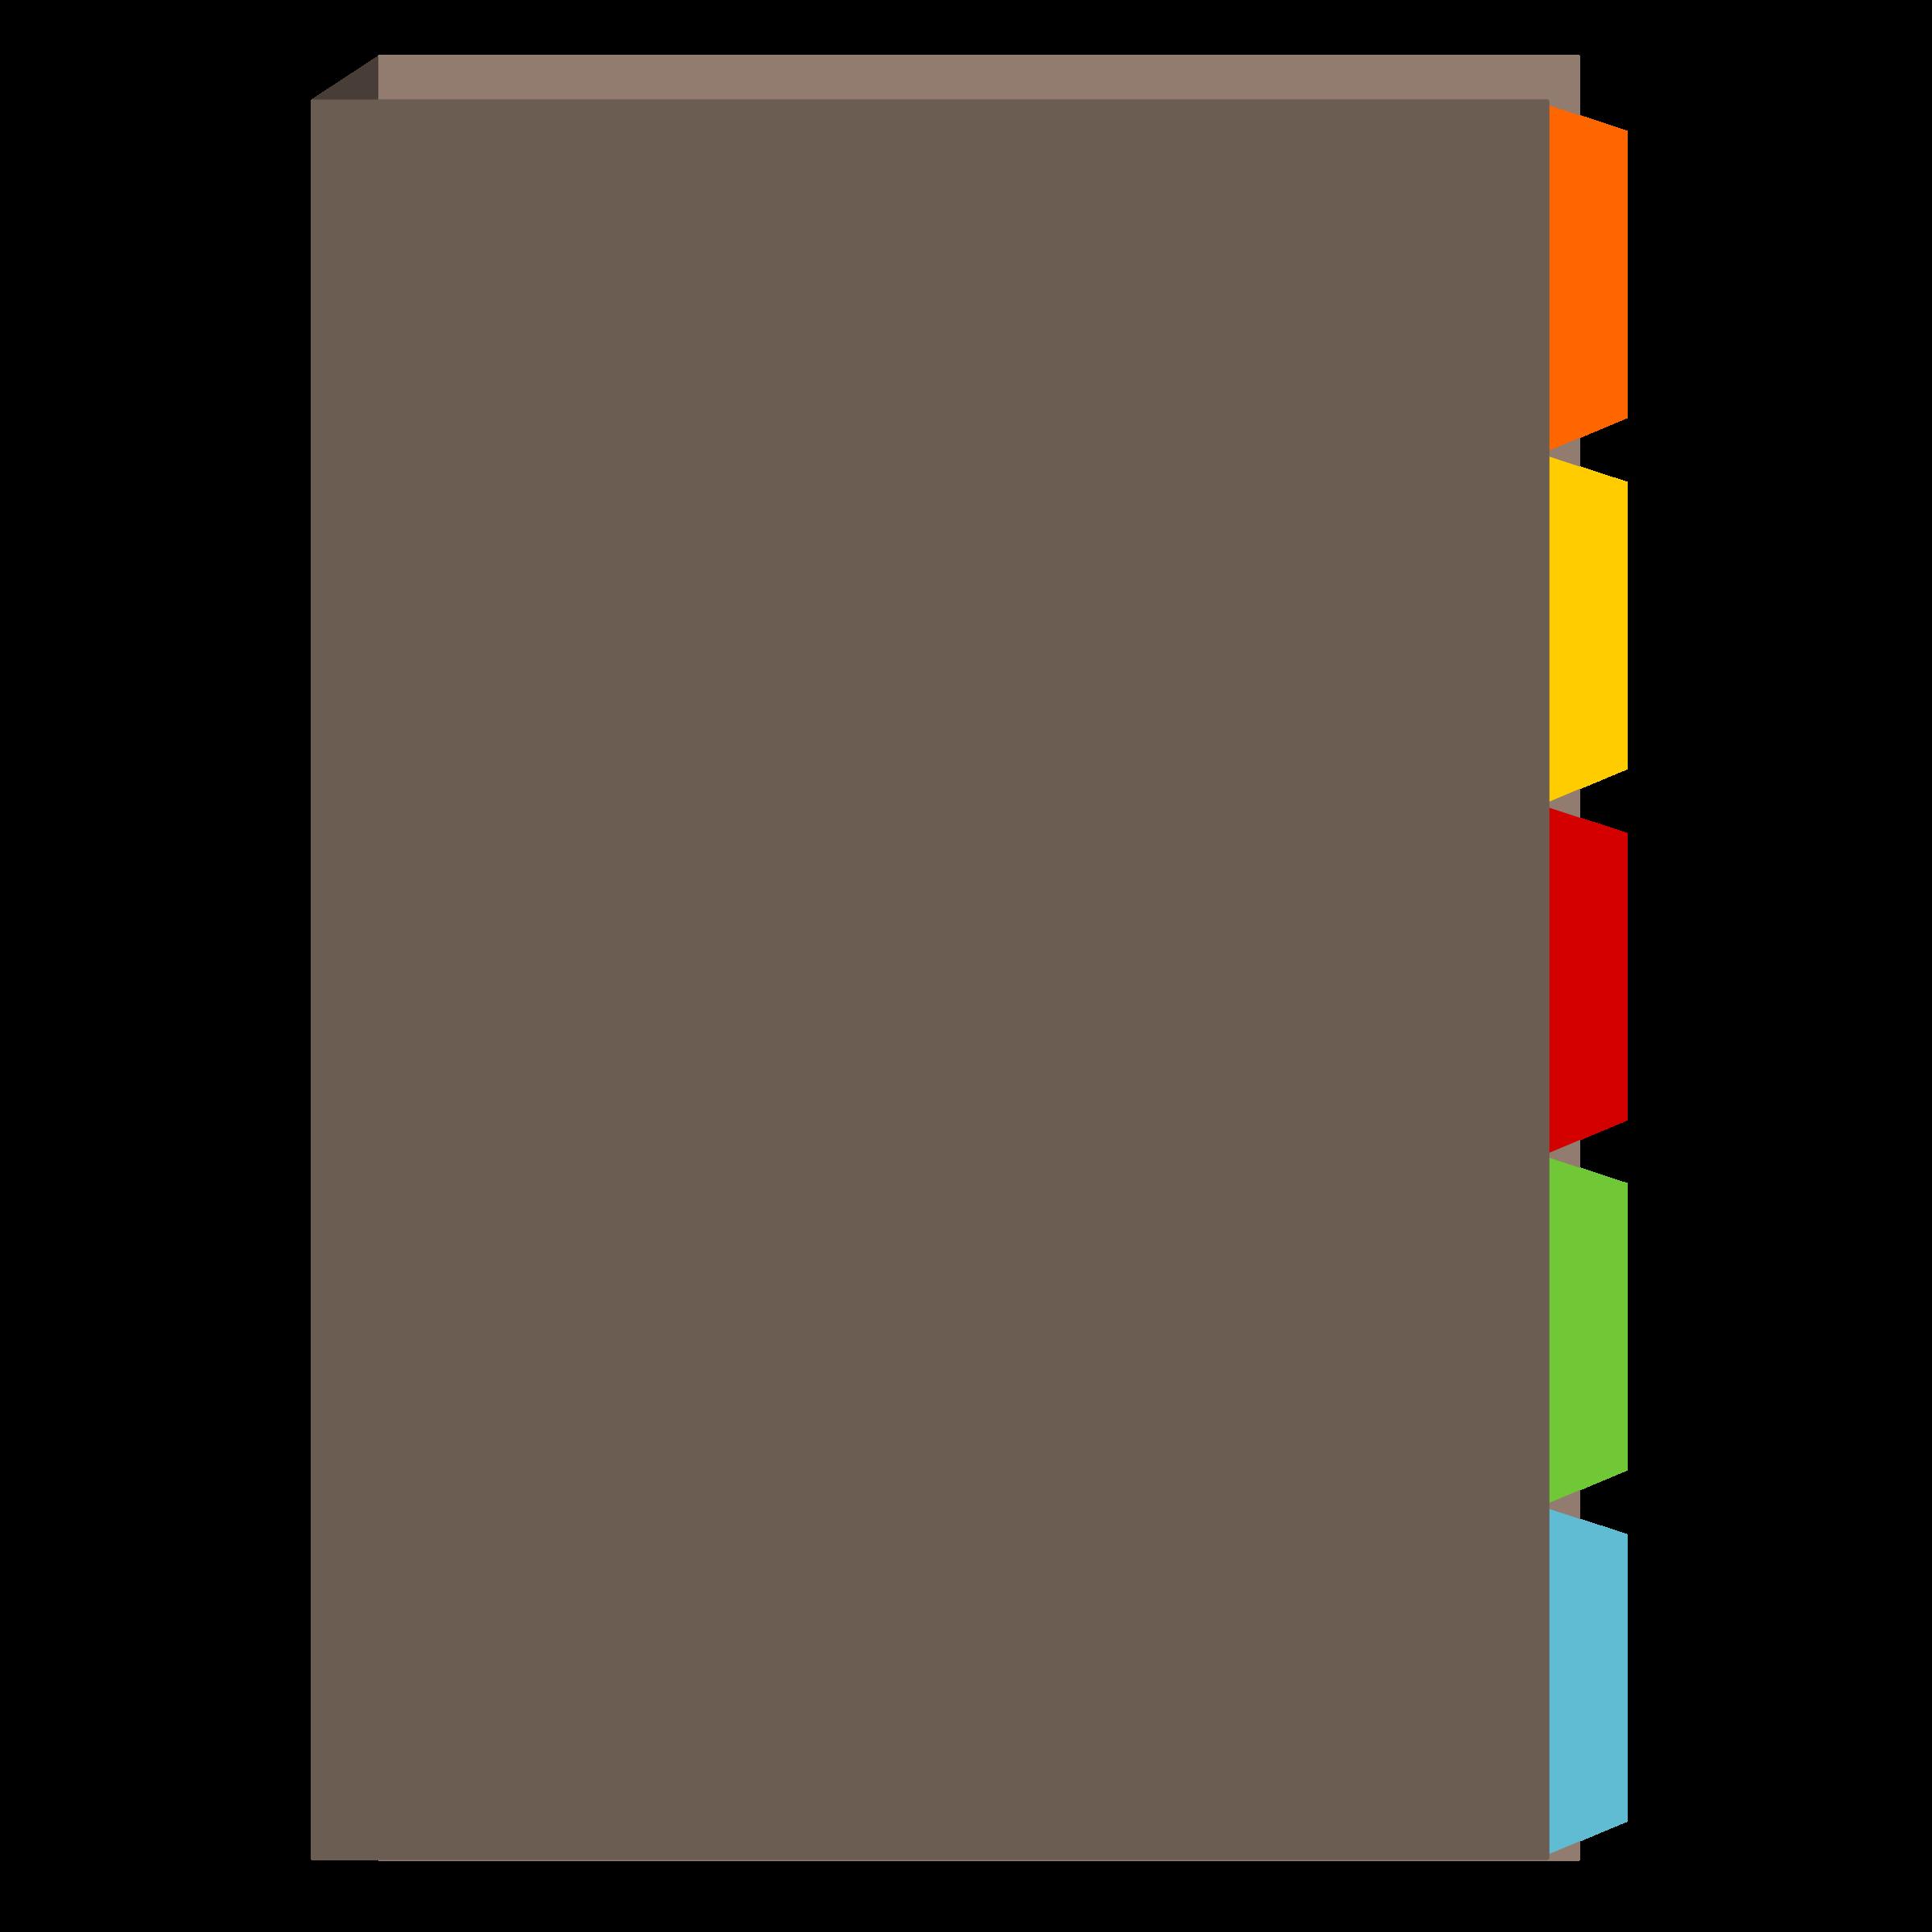 Office stationery file sorter. Organization clipart desk organizer